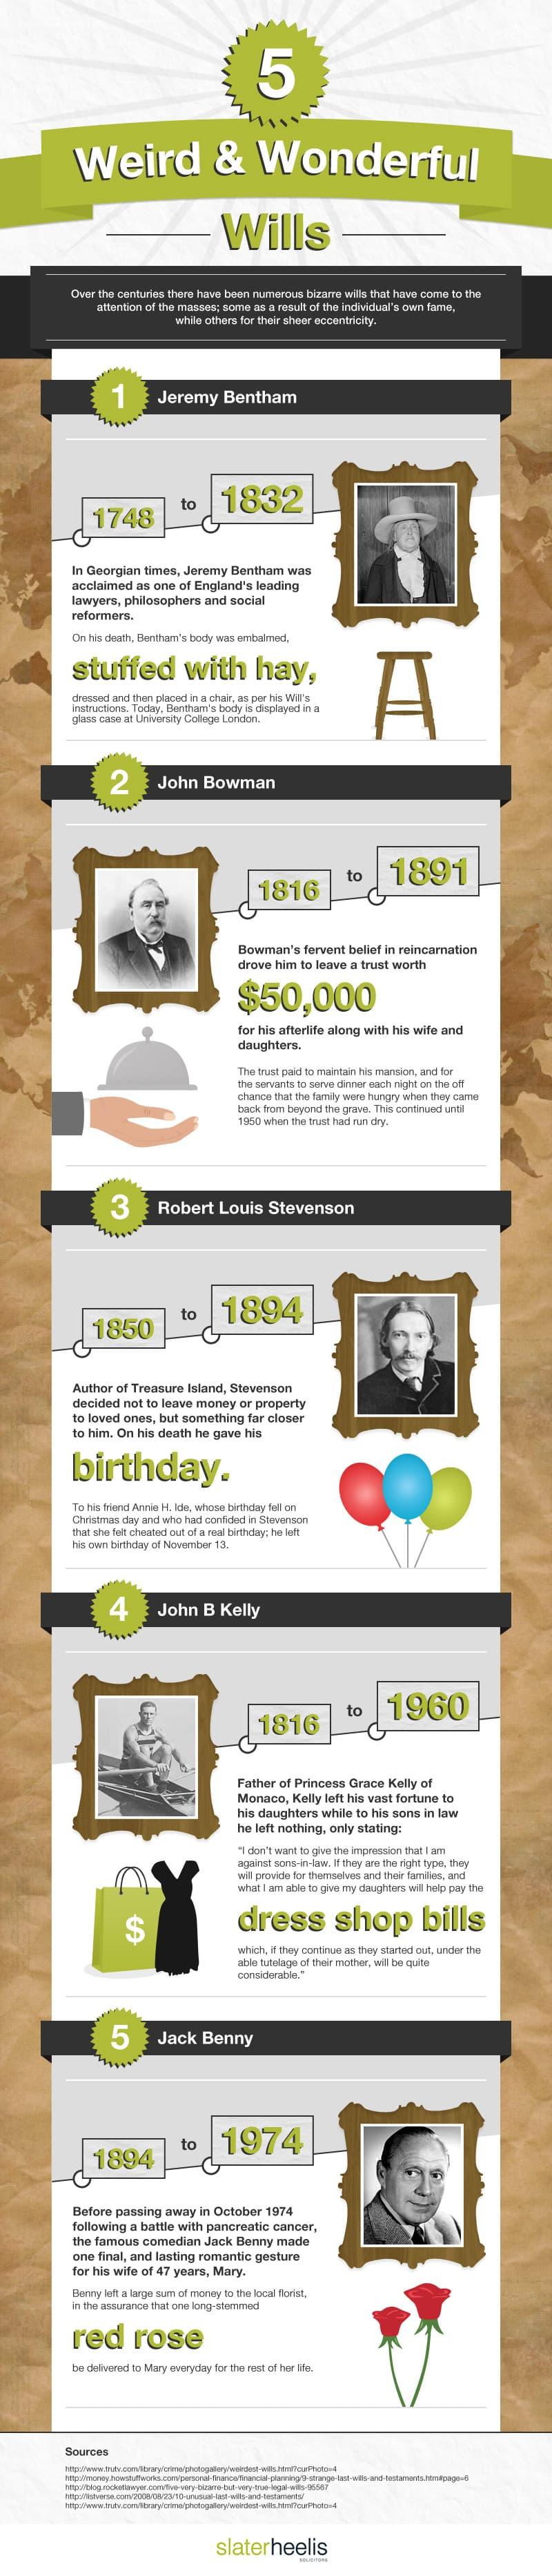 slater-heelis-wills-infographic